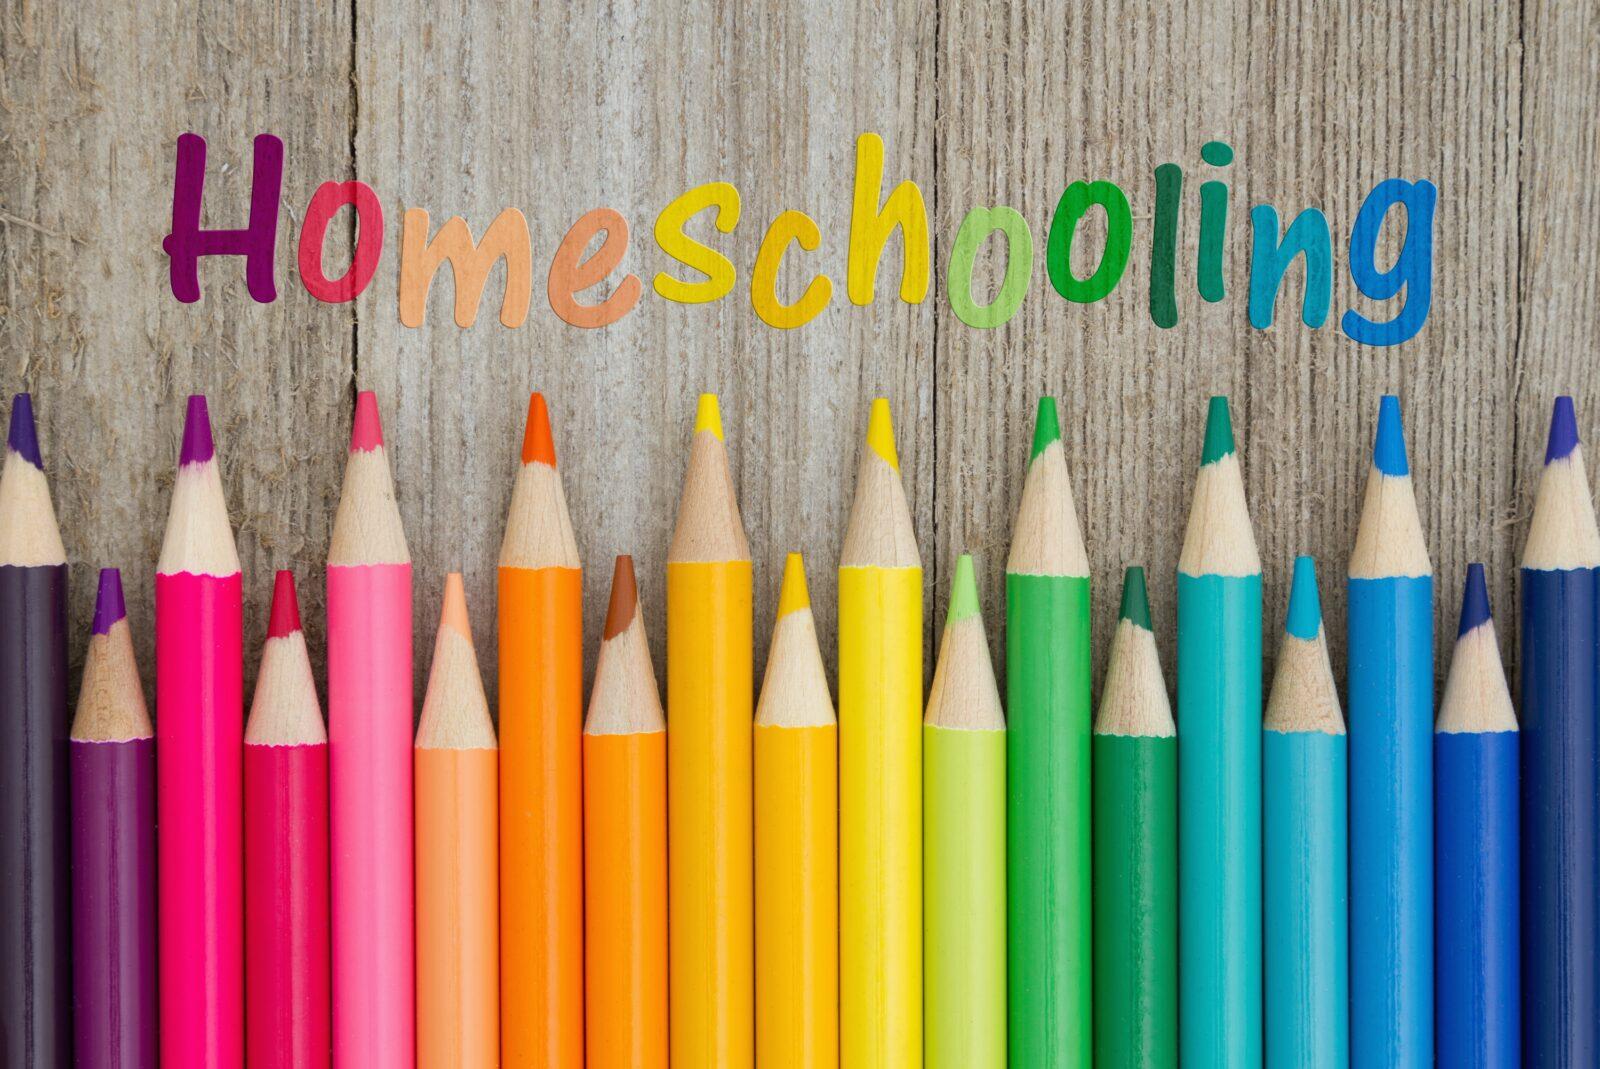 homeschool-colored-pencils-wooden-table